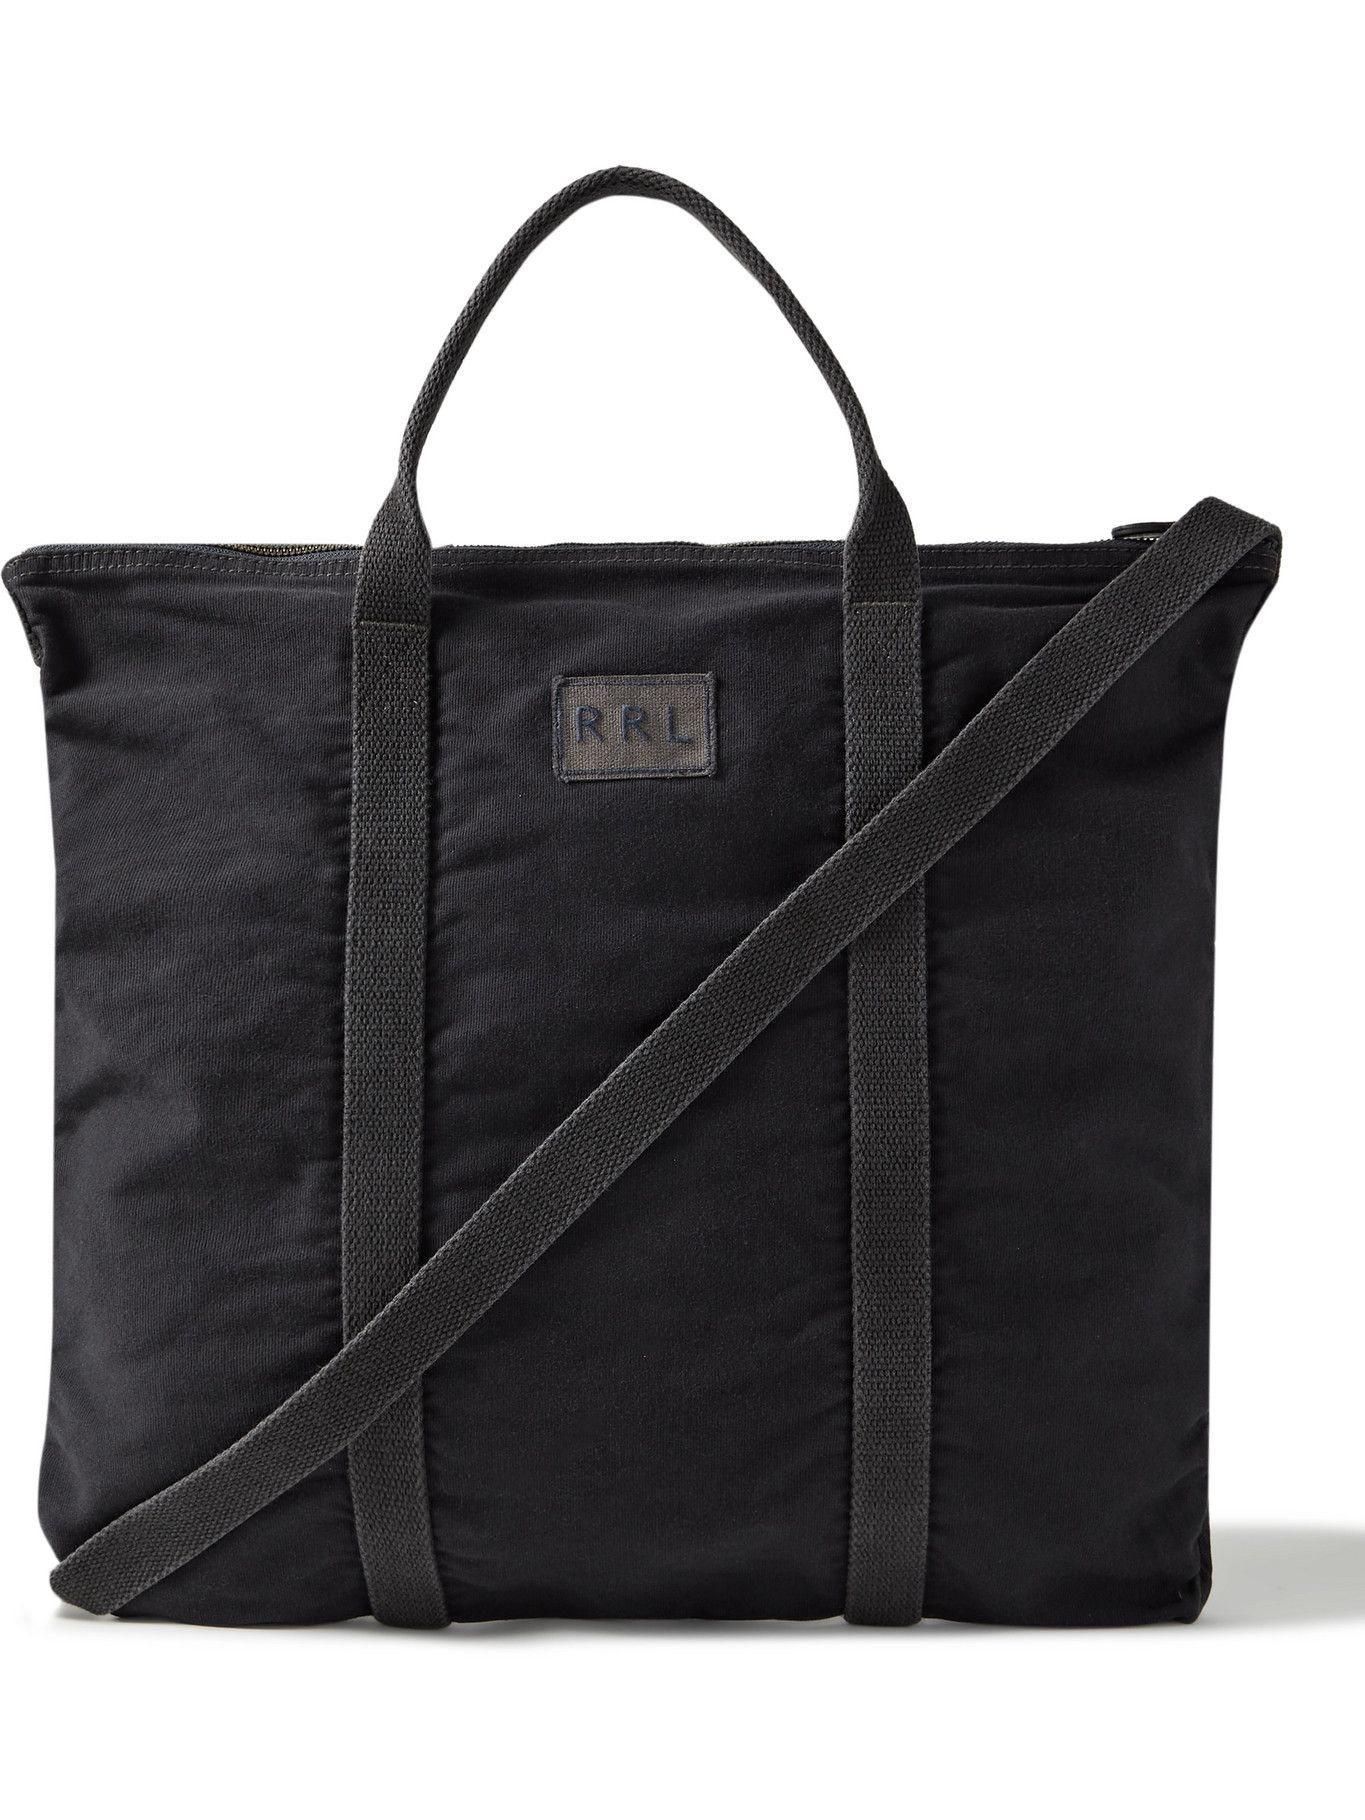 RRL - Logo-Appliquéd Cotton Tote Bag